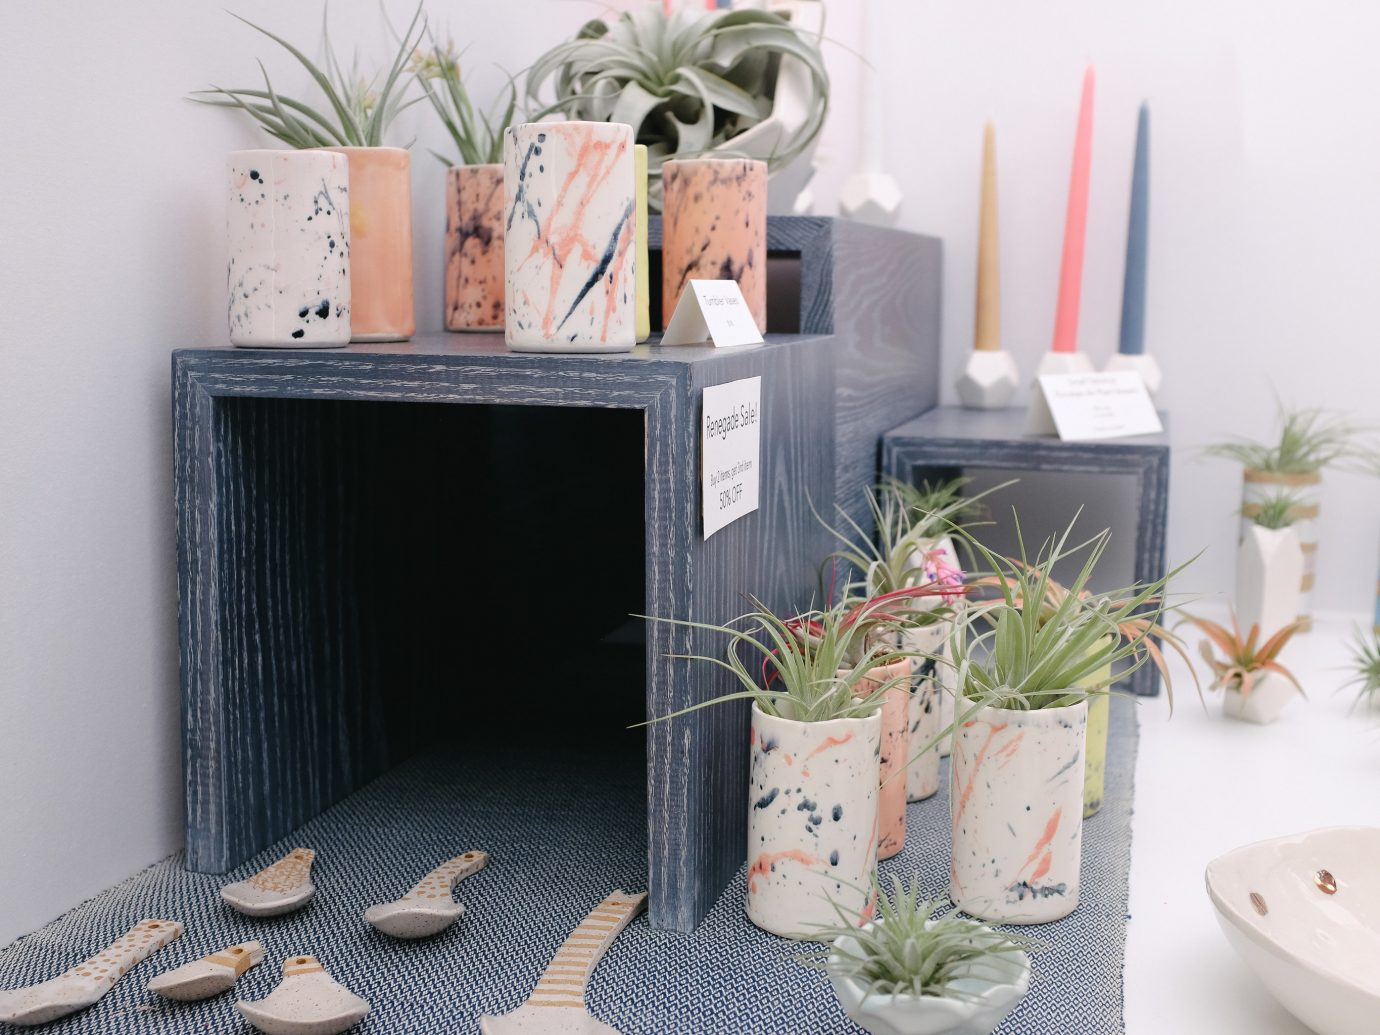 Offbeat wall indoor flowerpot furniture table product design flower